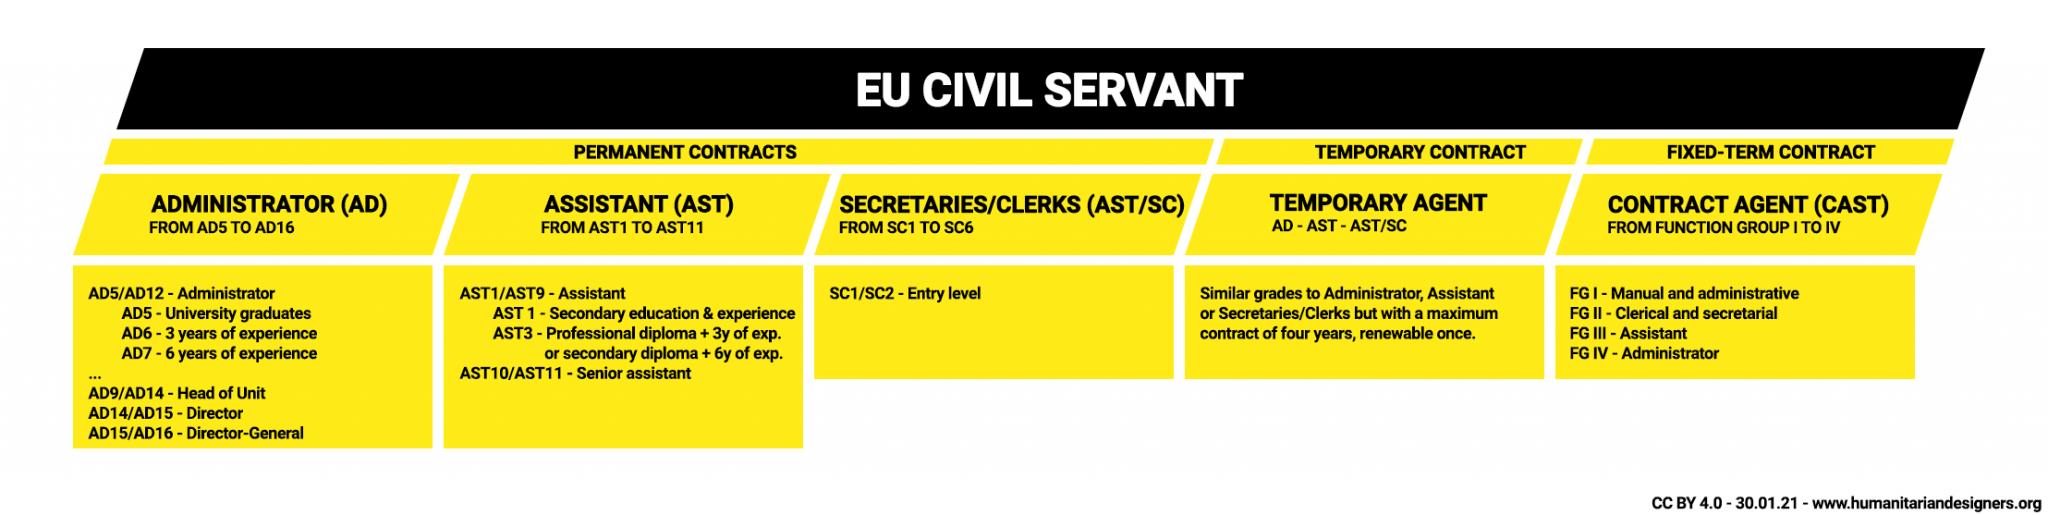 EU Civil servant European Union EPSO